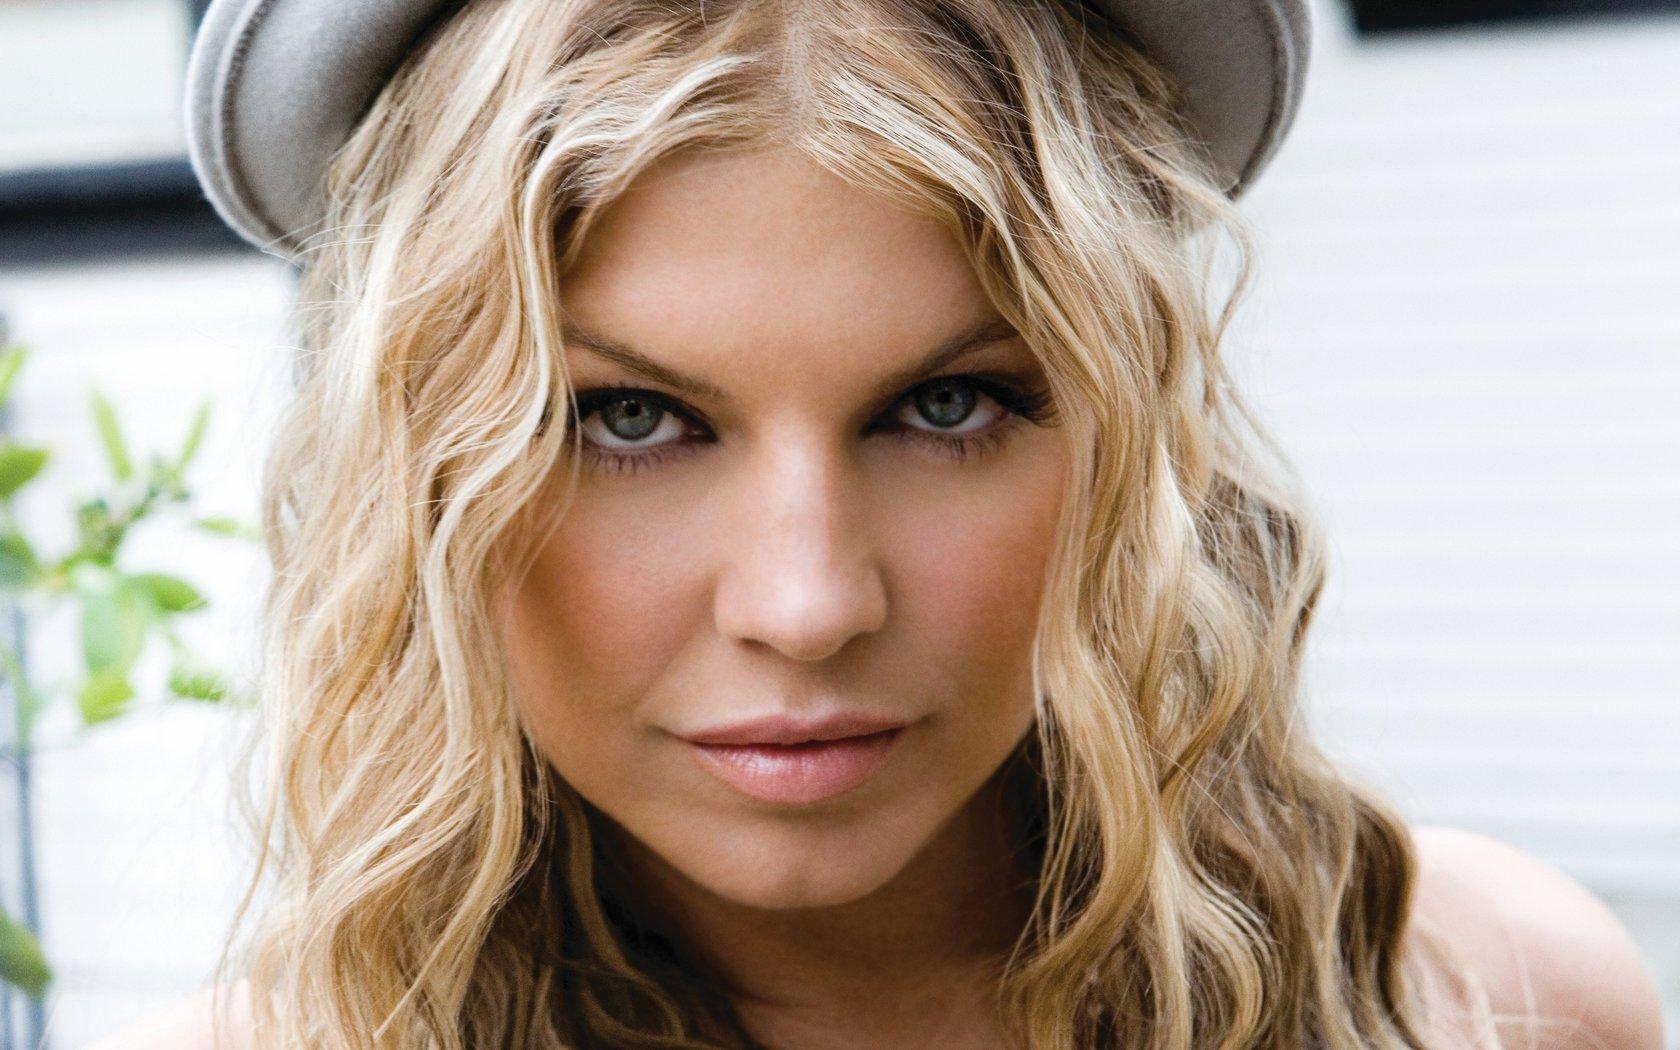 PopR ampB singer Fergie from The Fergie